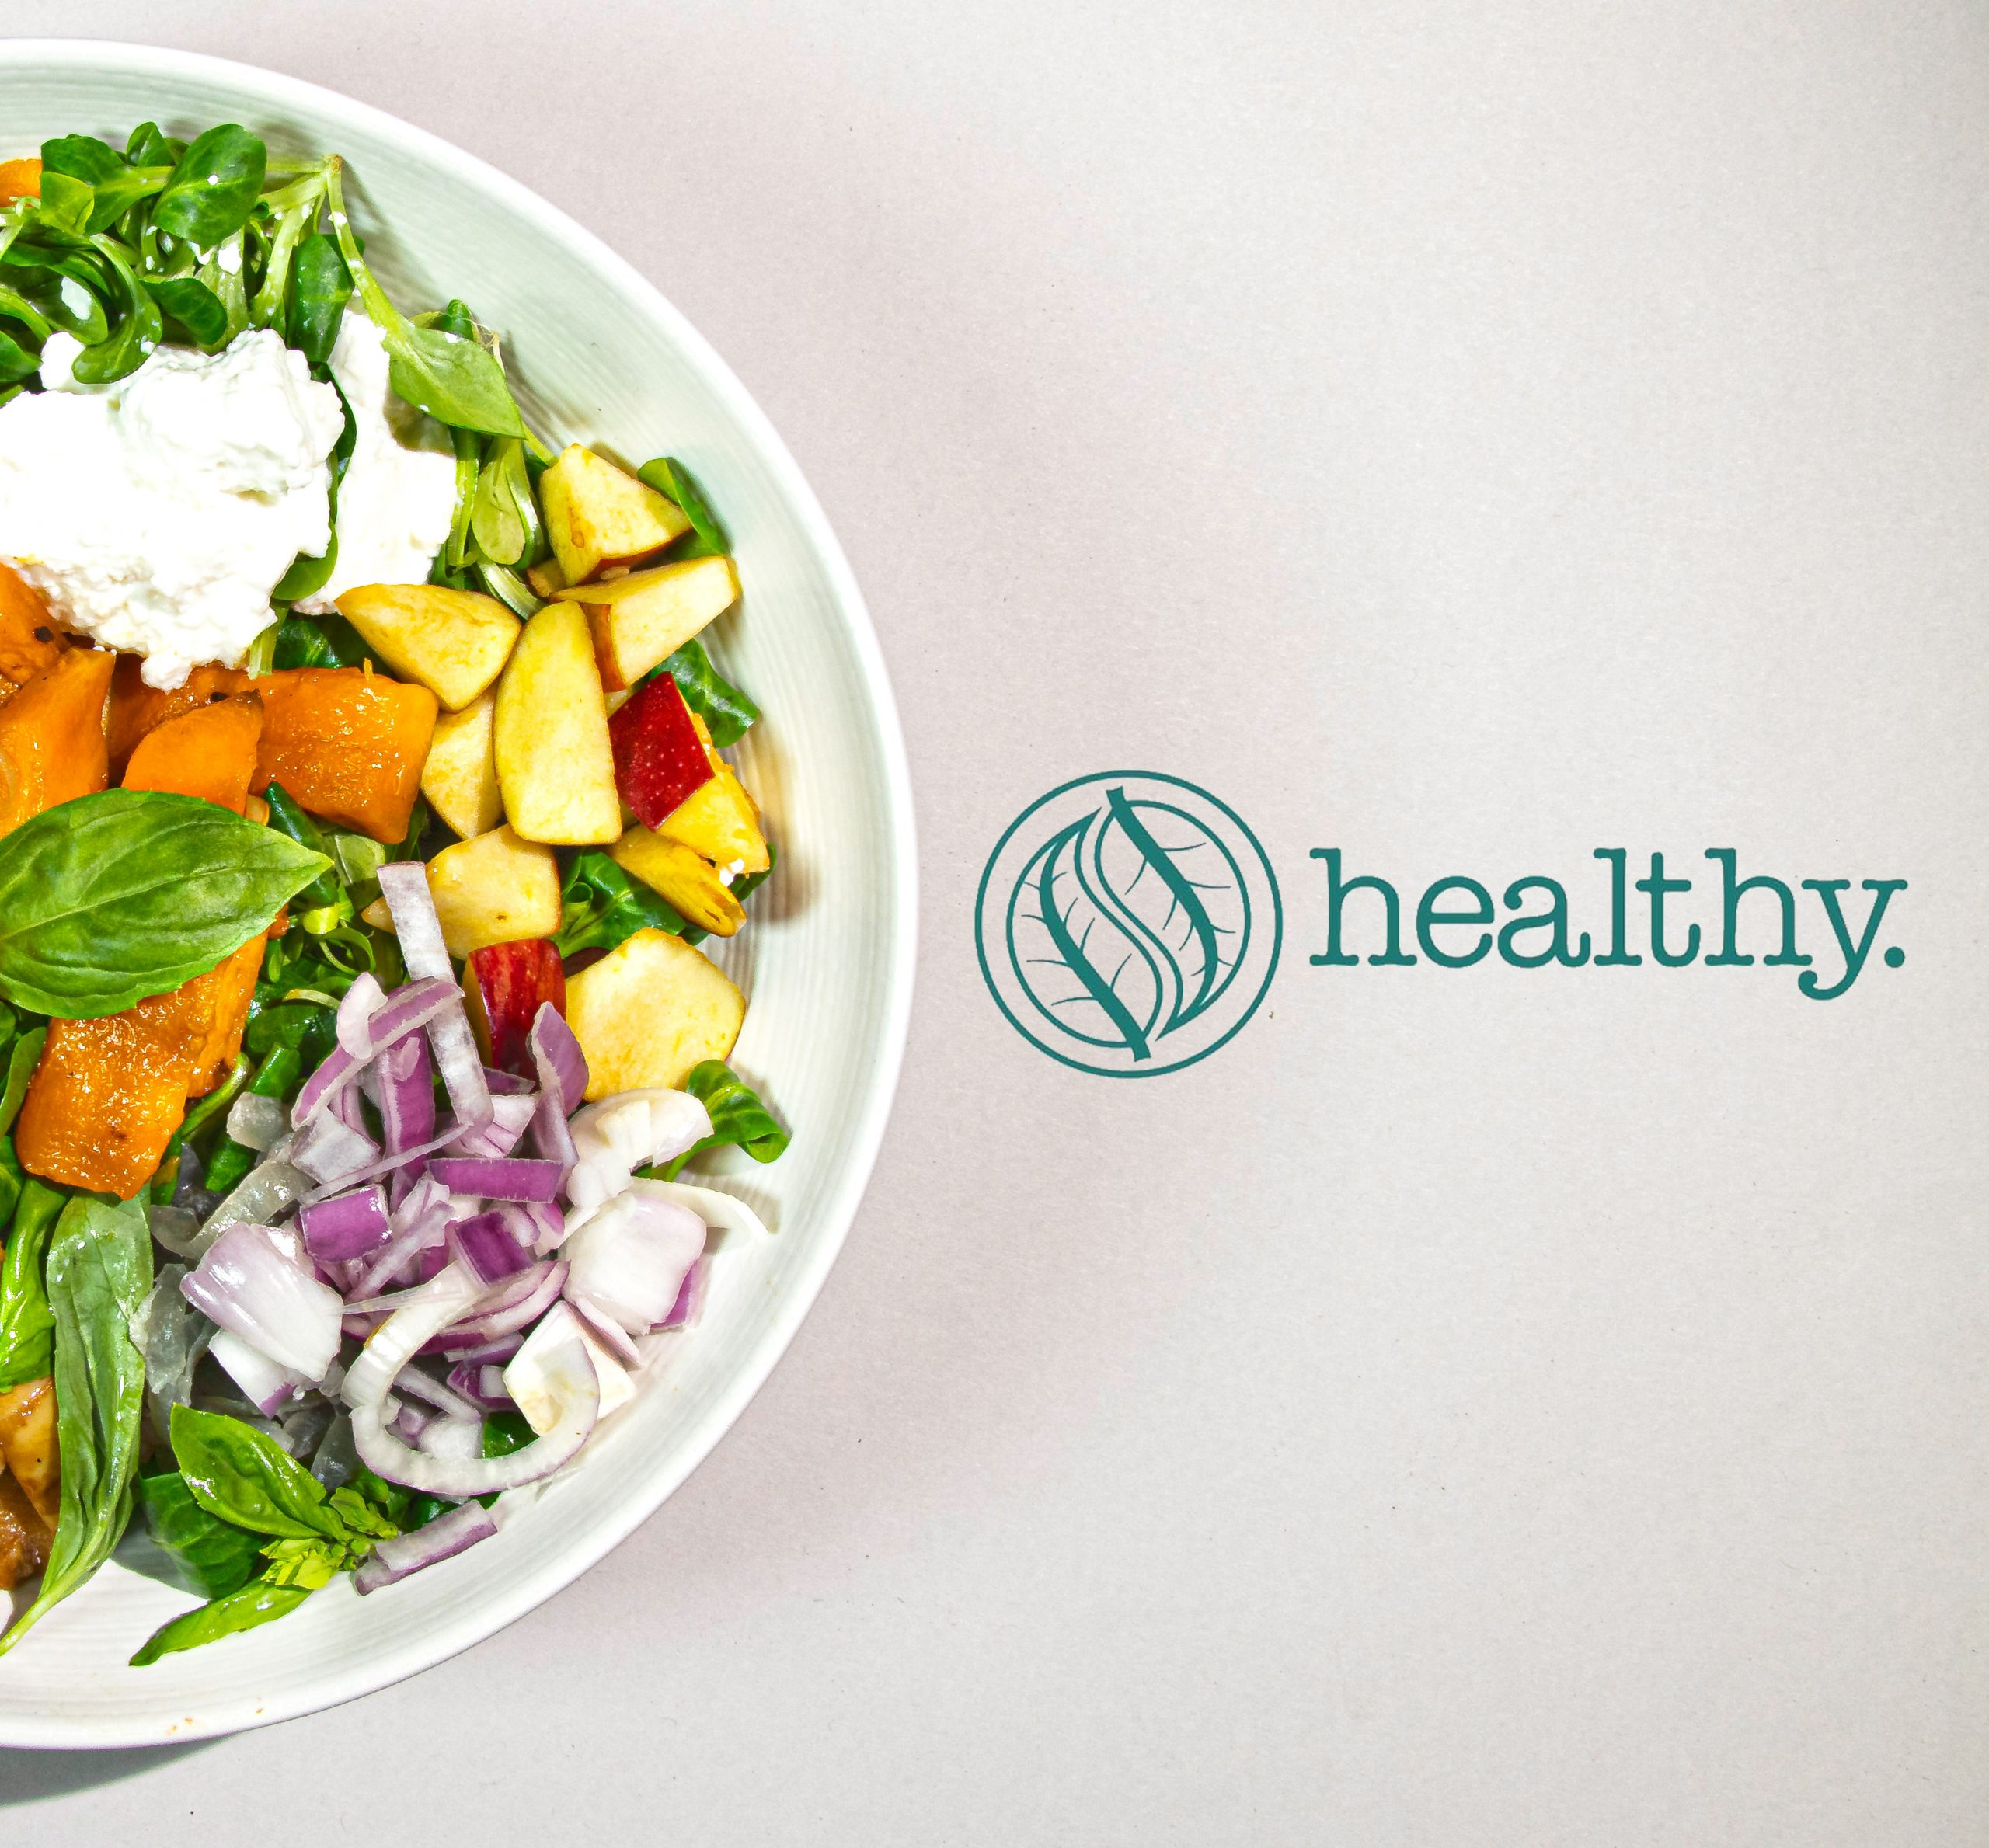 immagine menu invernale con logo Healthy